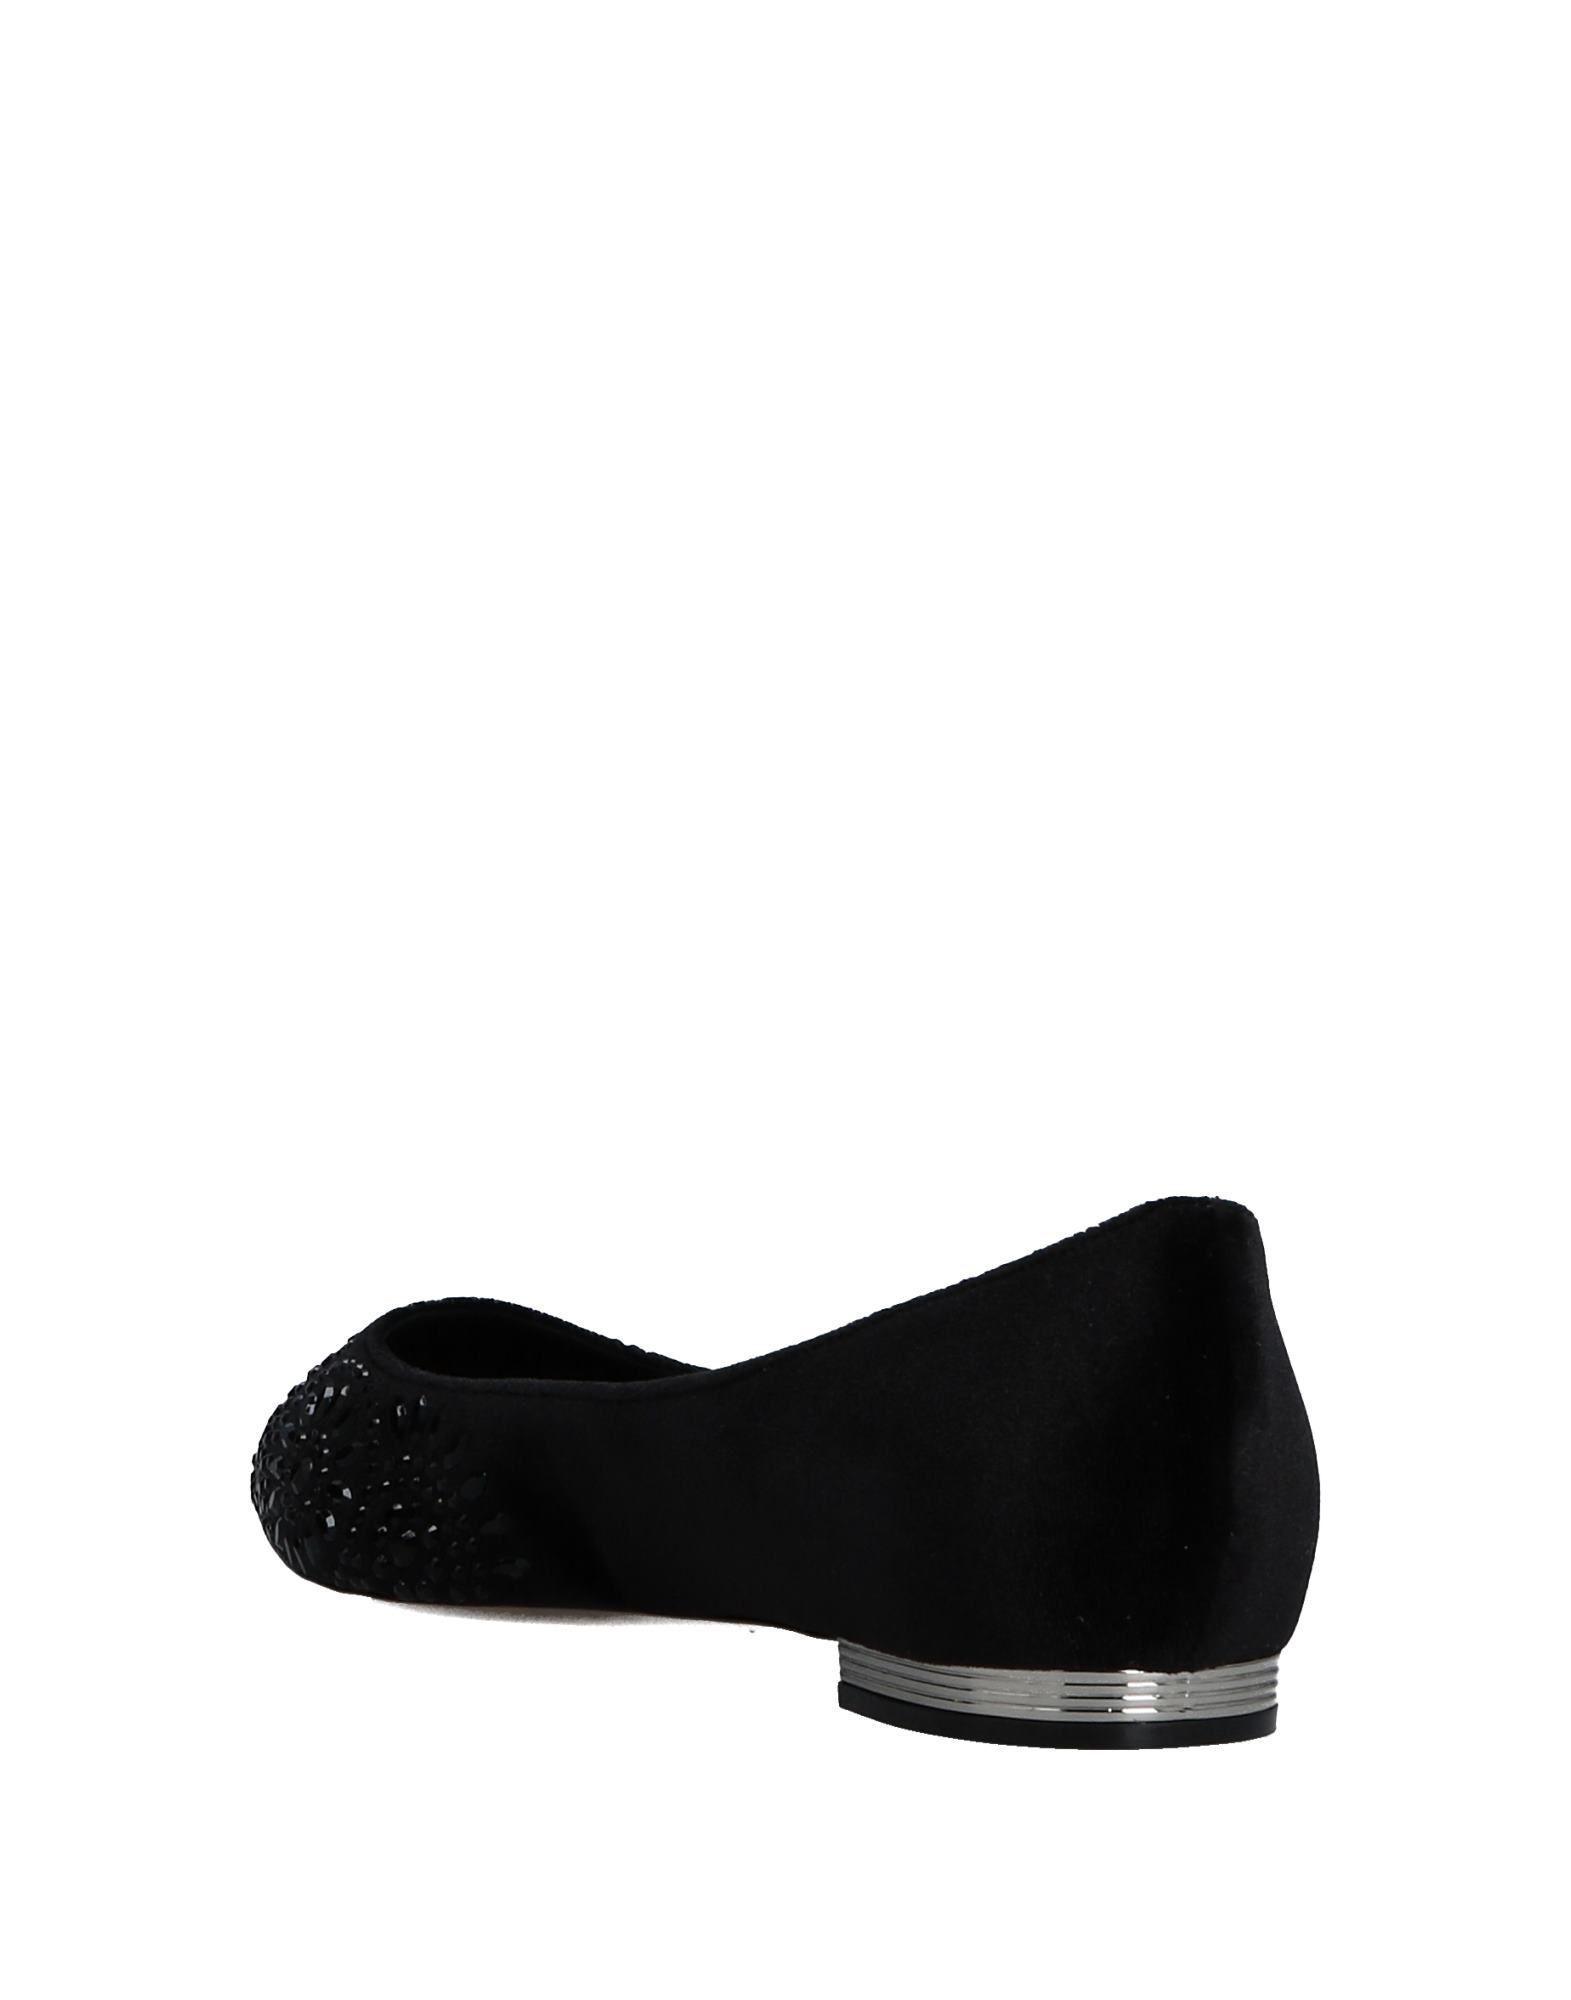 in Silla Lyst Flats Le Ballet Black fZCc1qIc